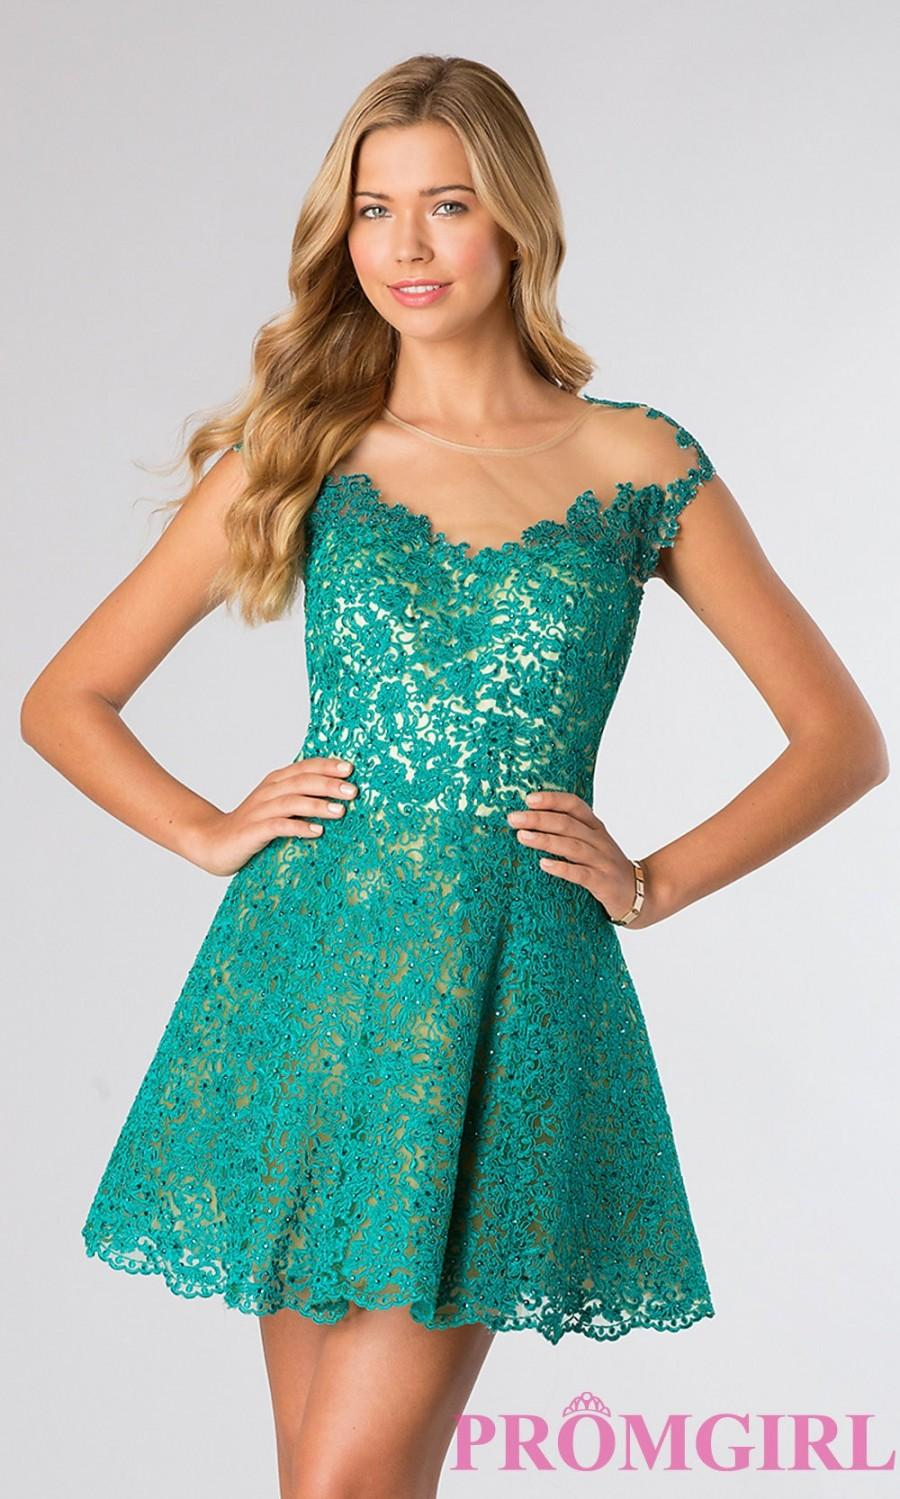 Short Open Back Lace Dress - Brand Prom Dresses #2576314 - Weddbook